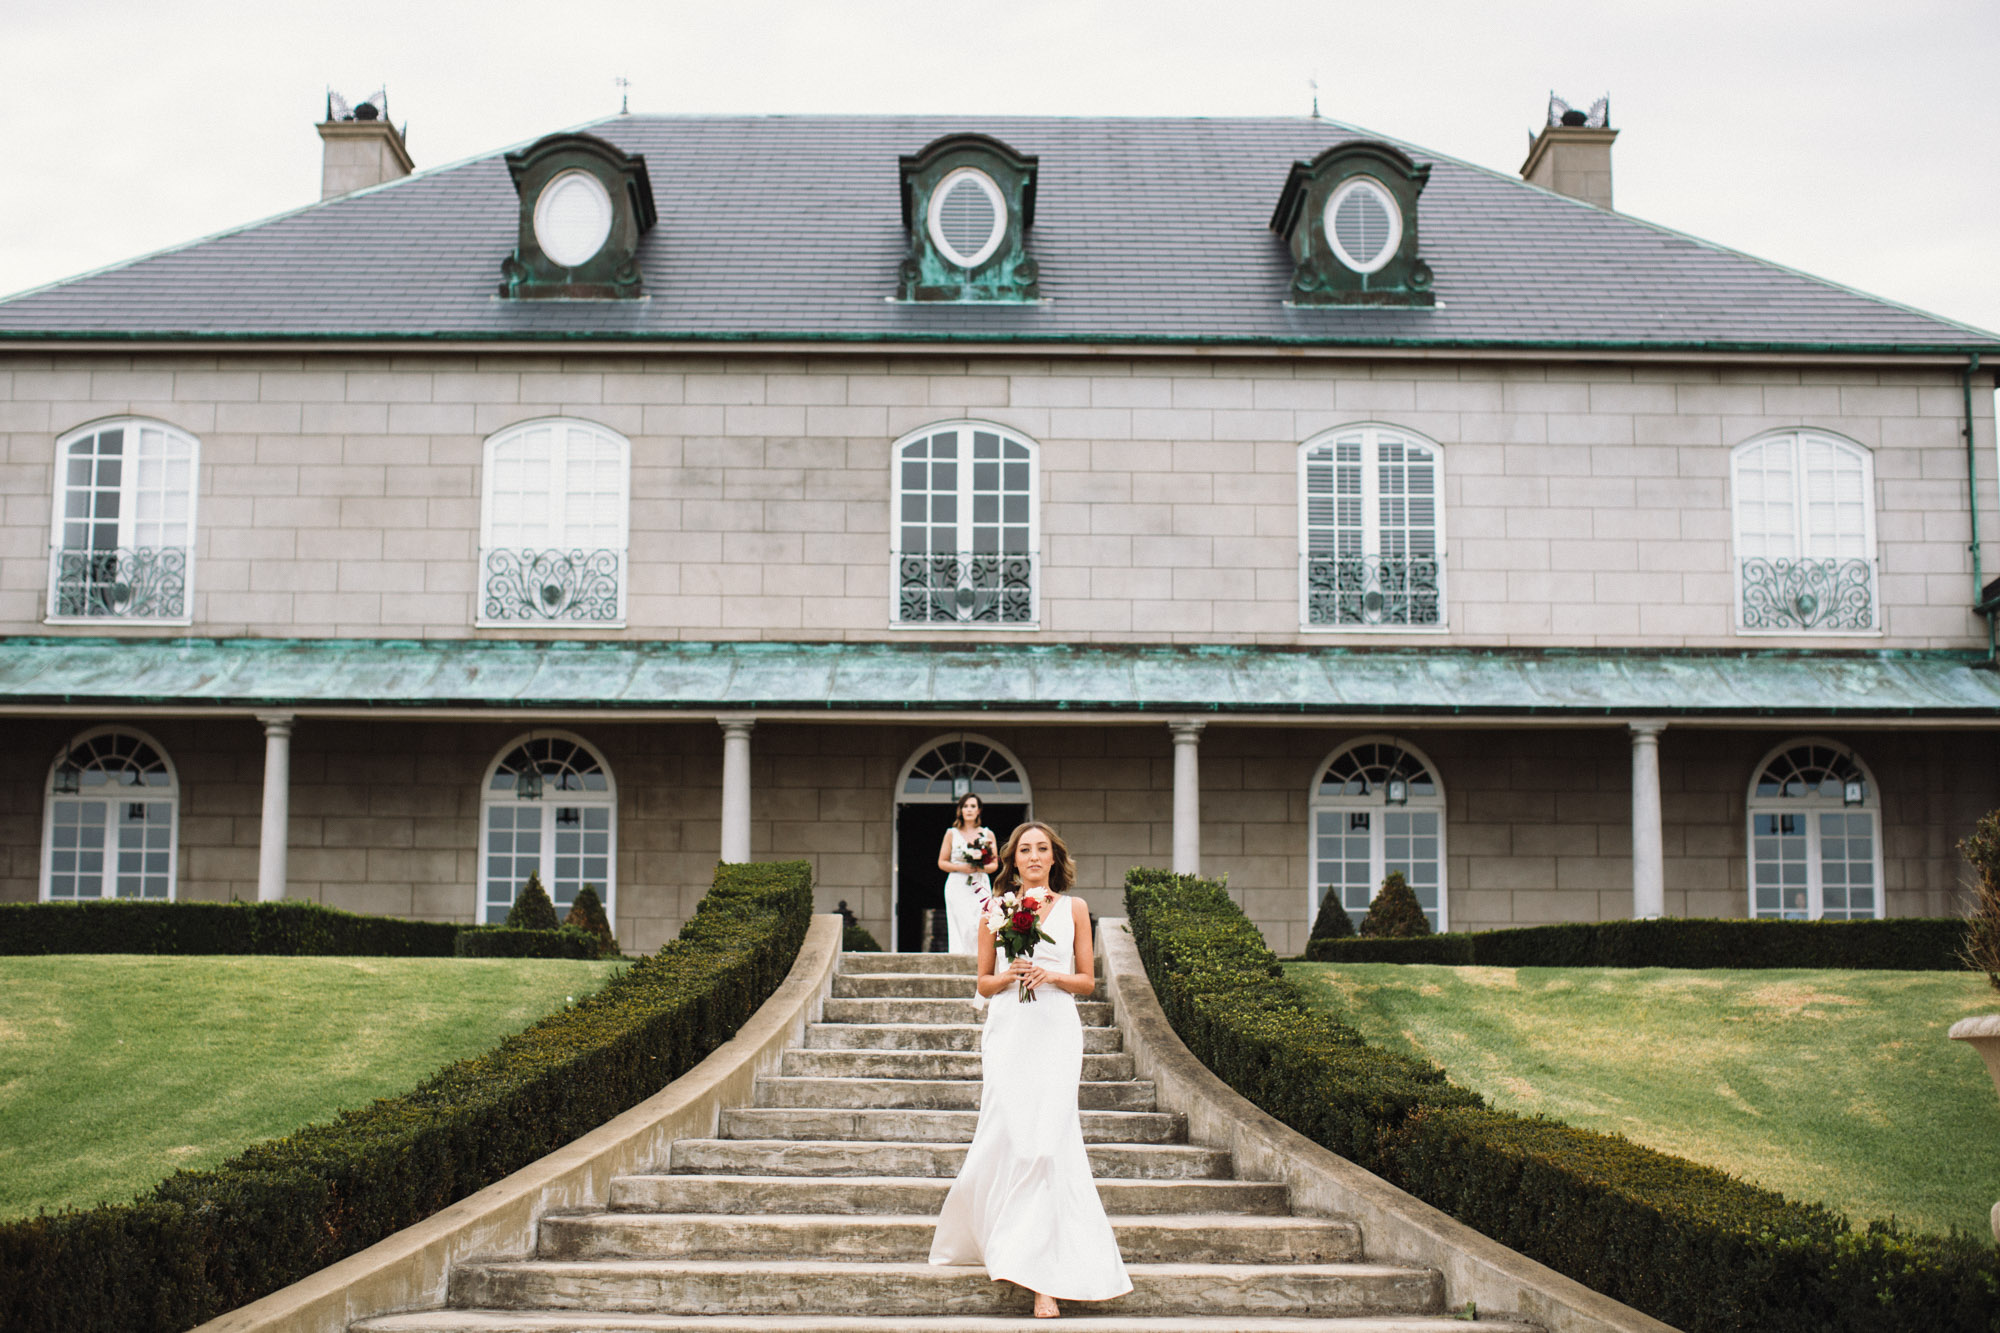 Campbell Point House Wedding HJ + Dean Raphael Weddings-69.jpg